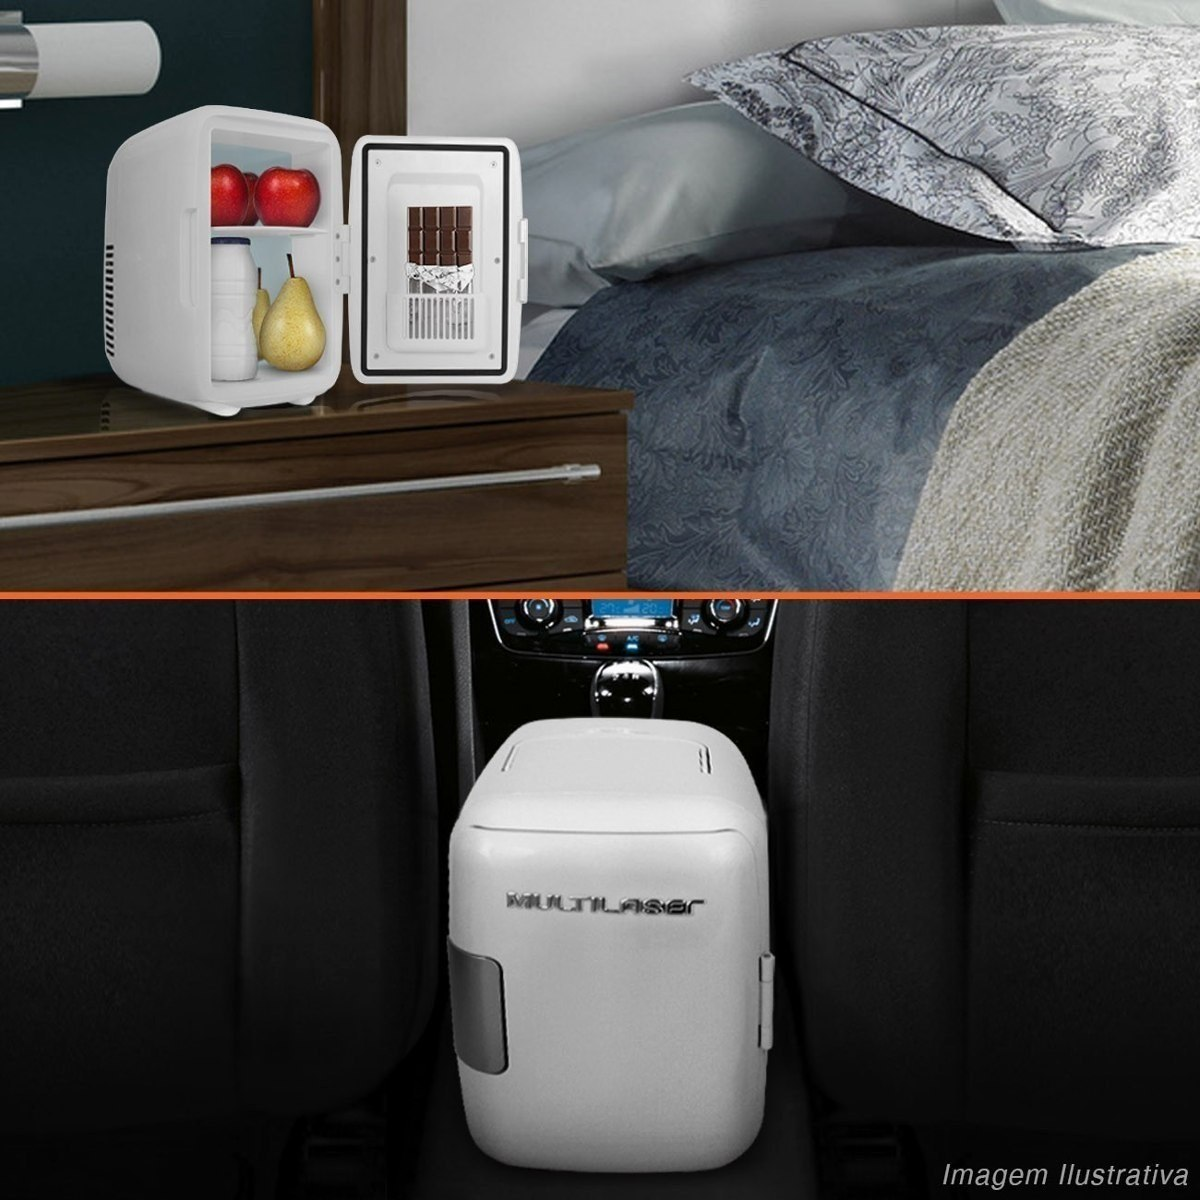 Mini Geladeira Portátil Branca 4 Litros Refrigera e Aquece 220 Volts Multilaser TV010